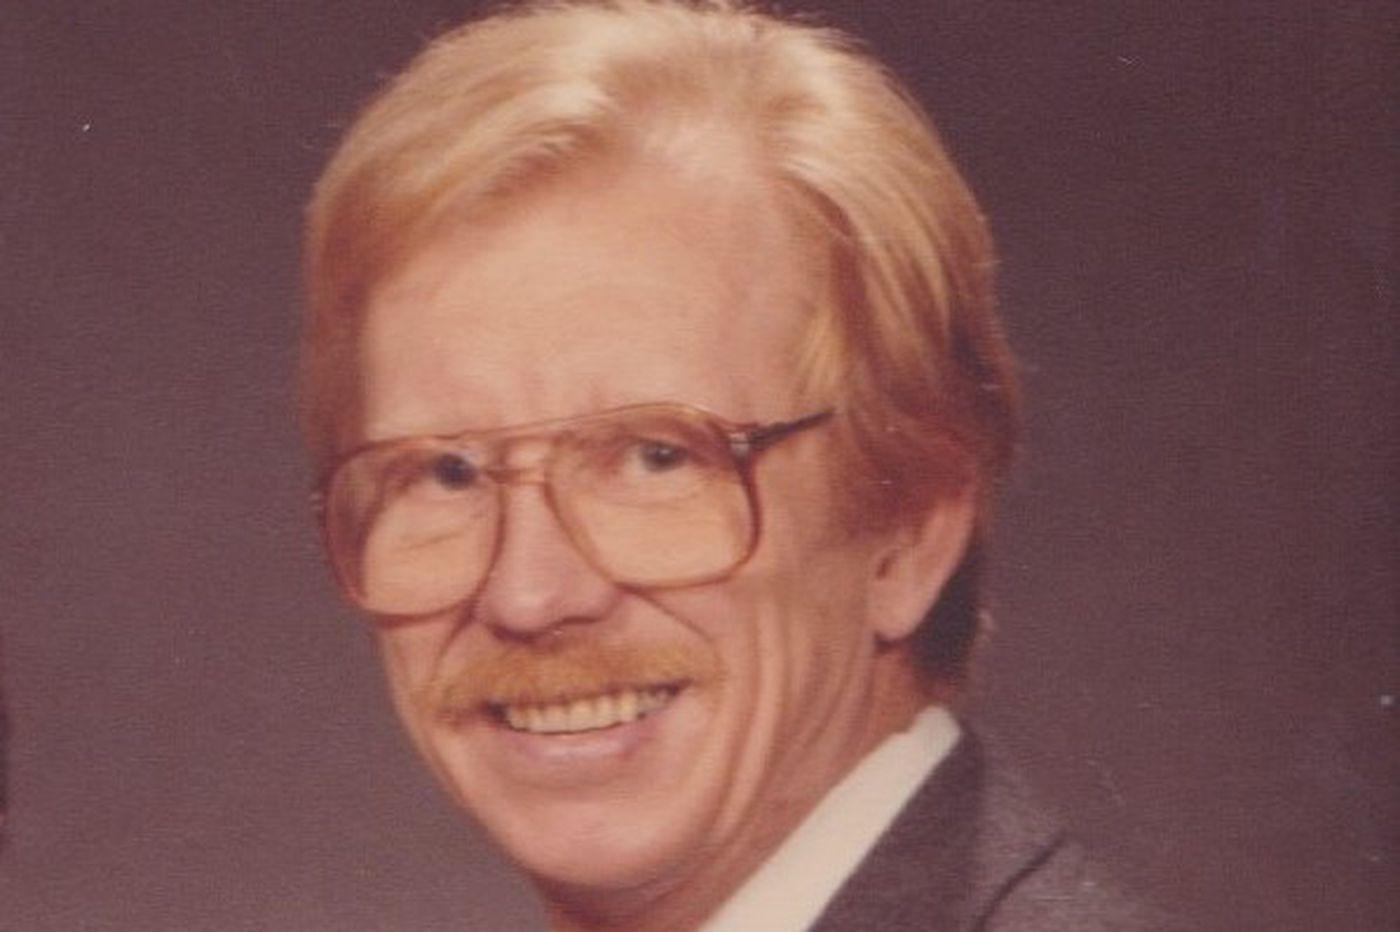 Kaarlo J. Hamalainen, 88, engineer whose work laid the groundwork for high-definition TV